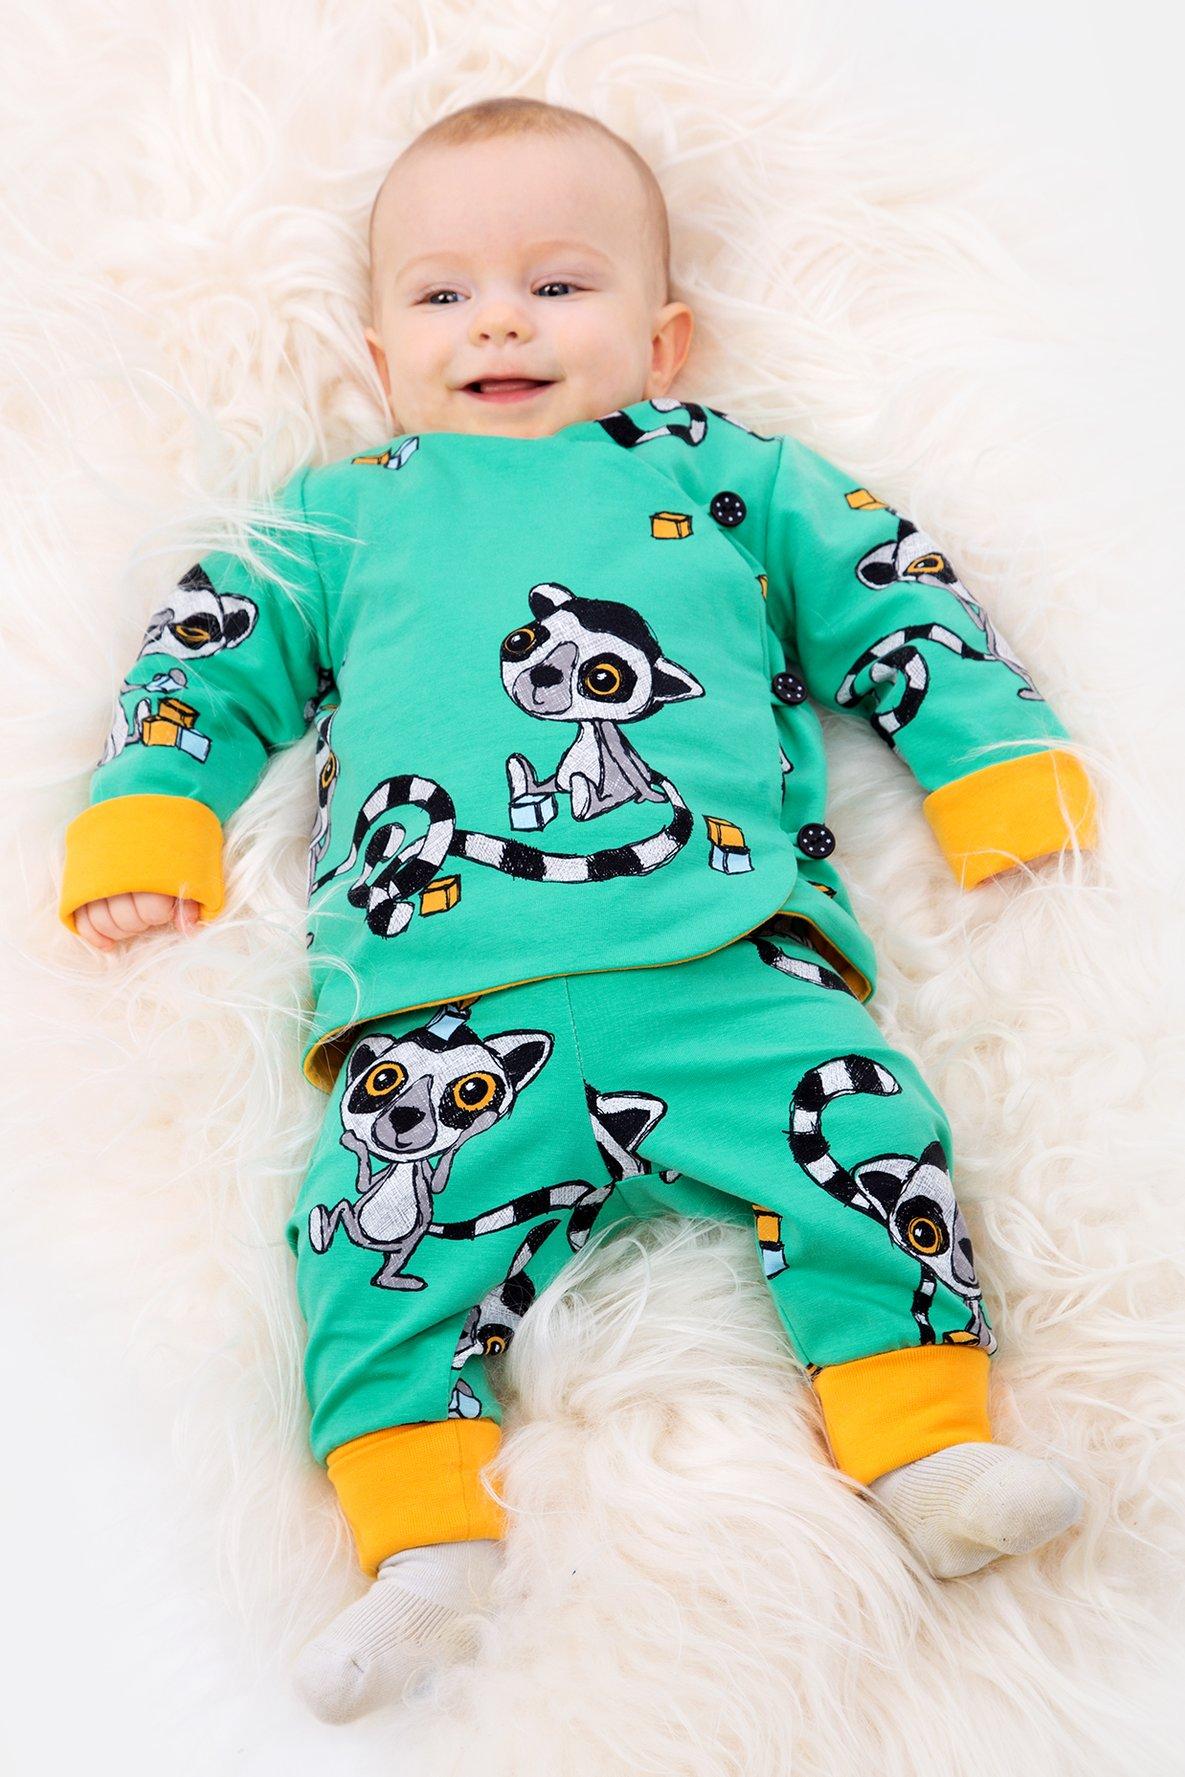 Baby pumphose nähen